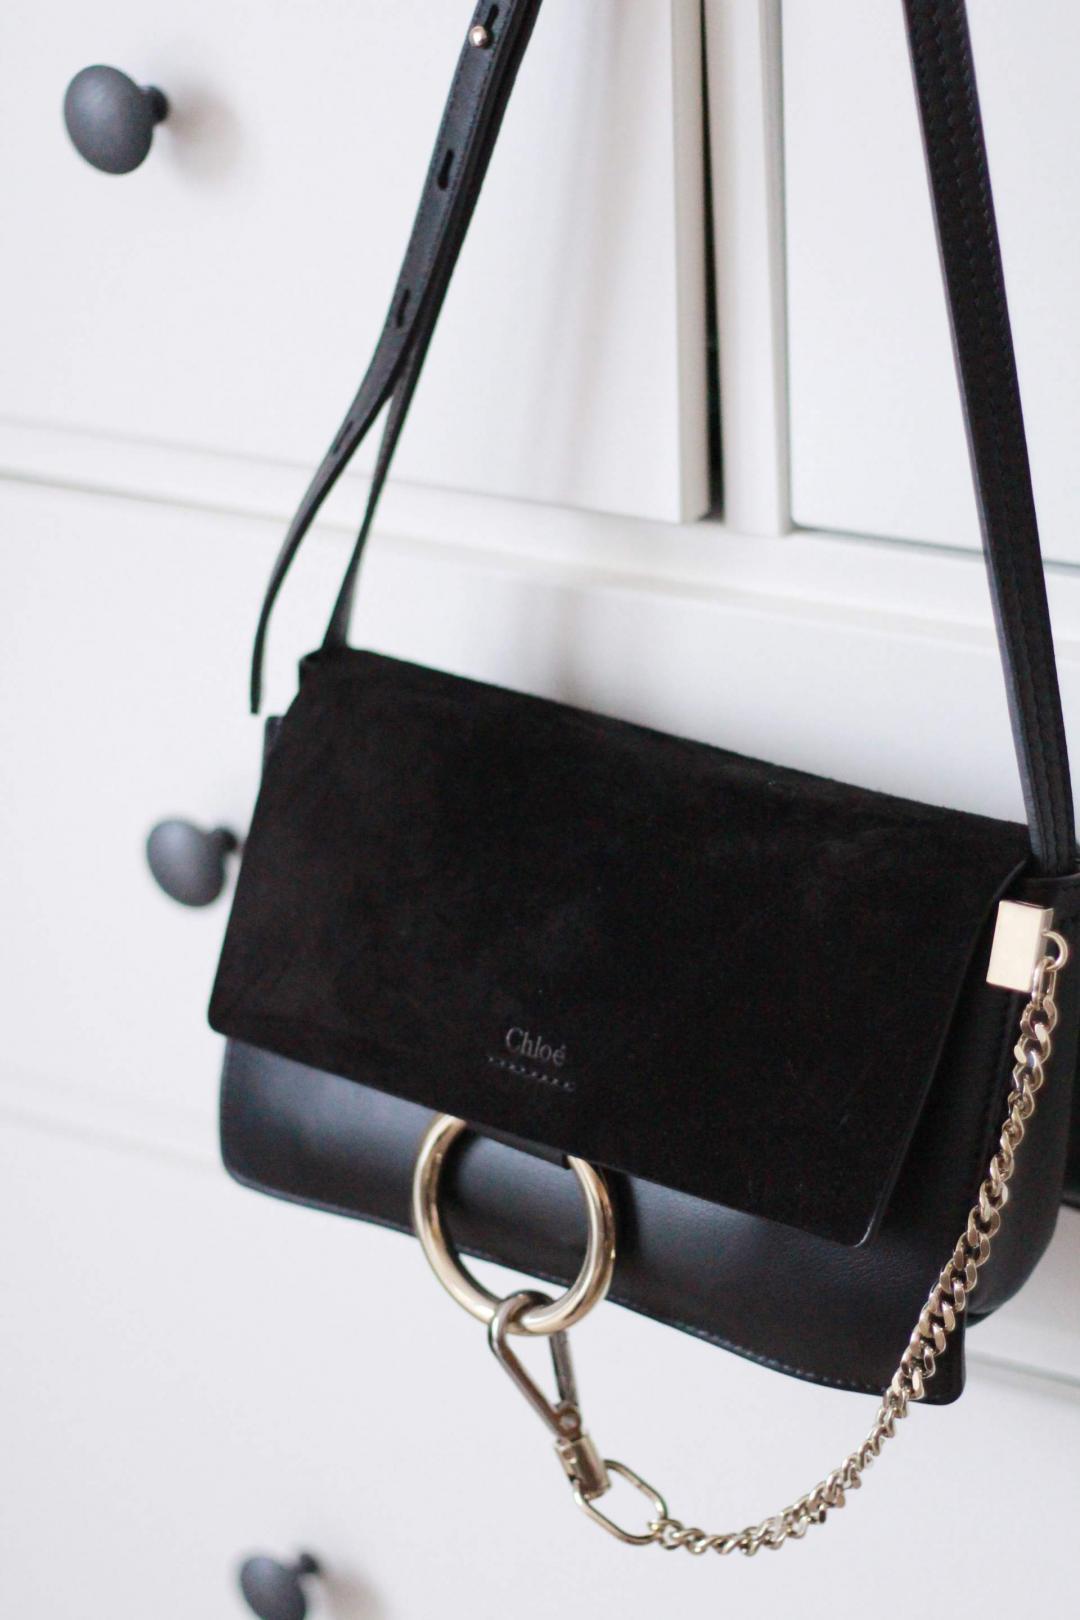 chloe-faye-bag-small-black-leather-suede-mix- ... 40f1bc4874ebb